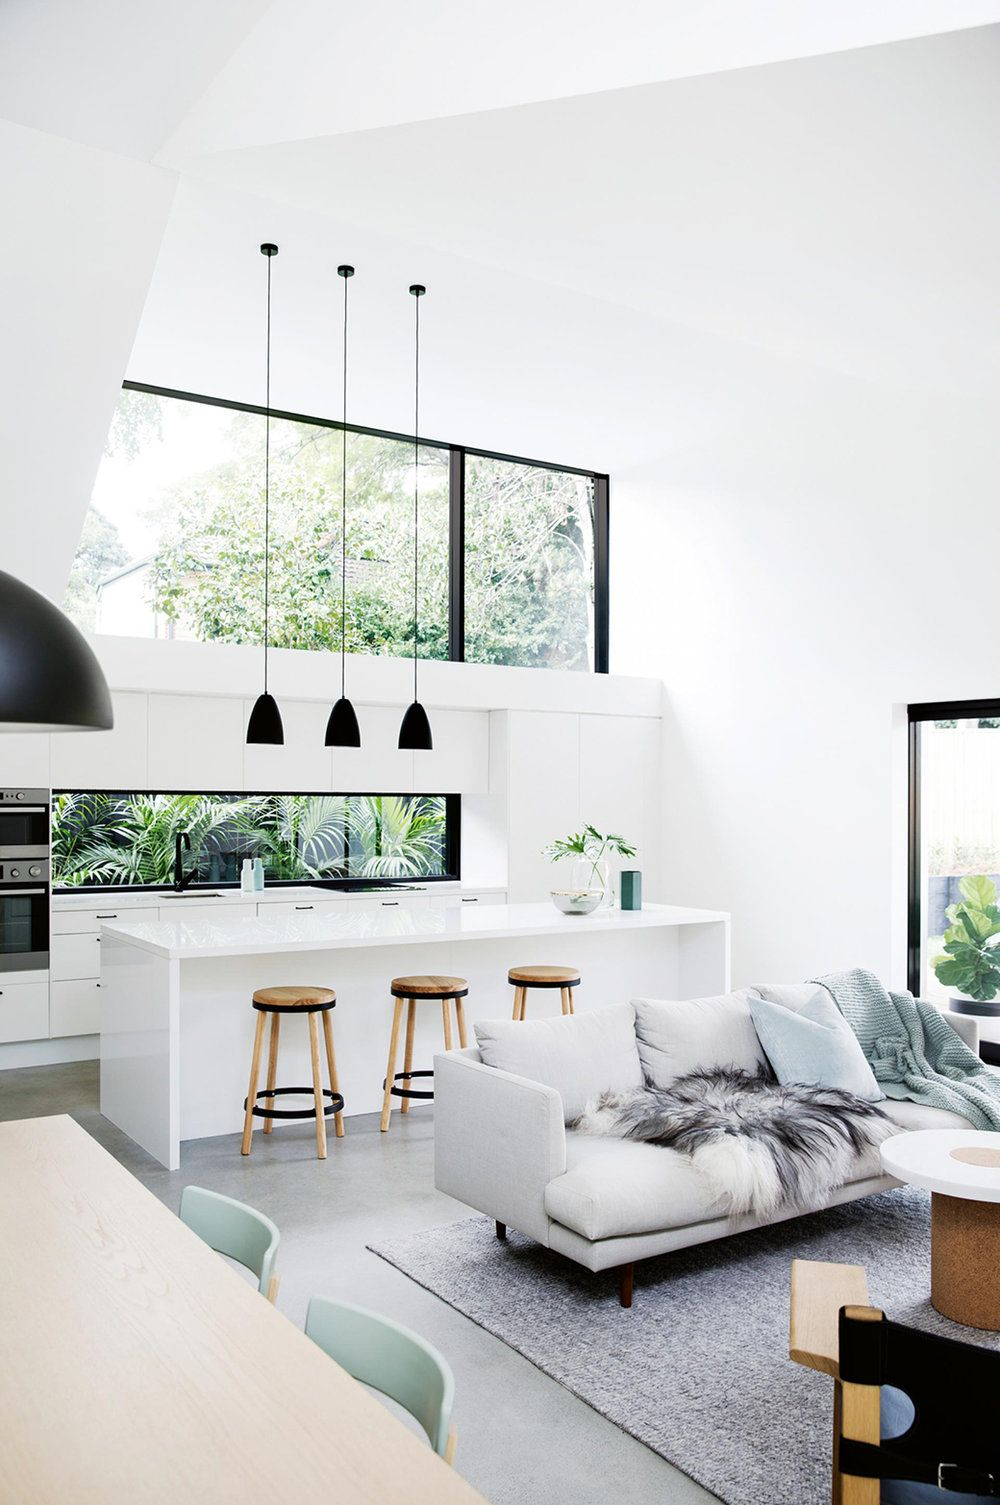 Budget Friendly Home That Looks Like A Million